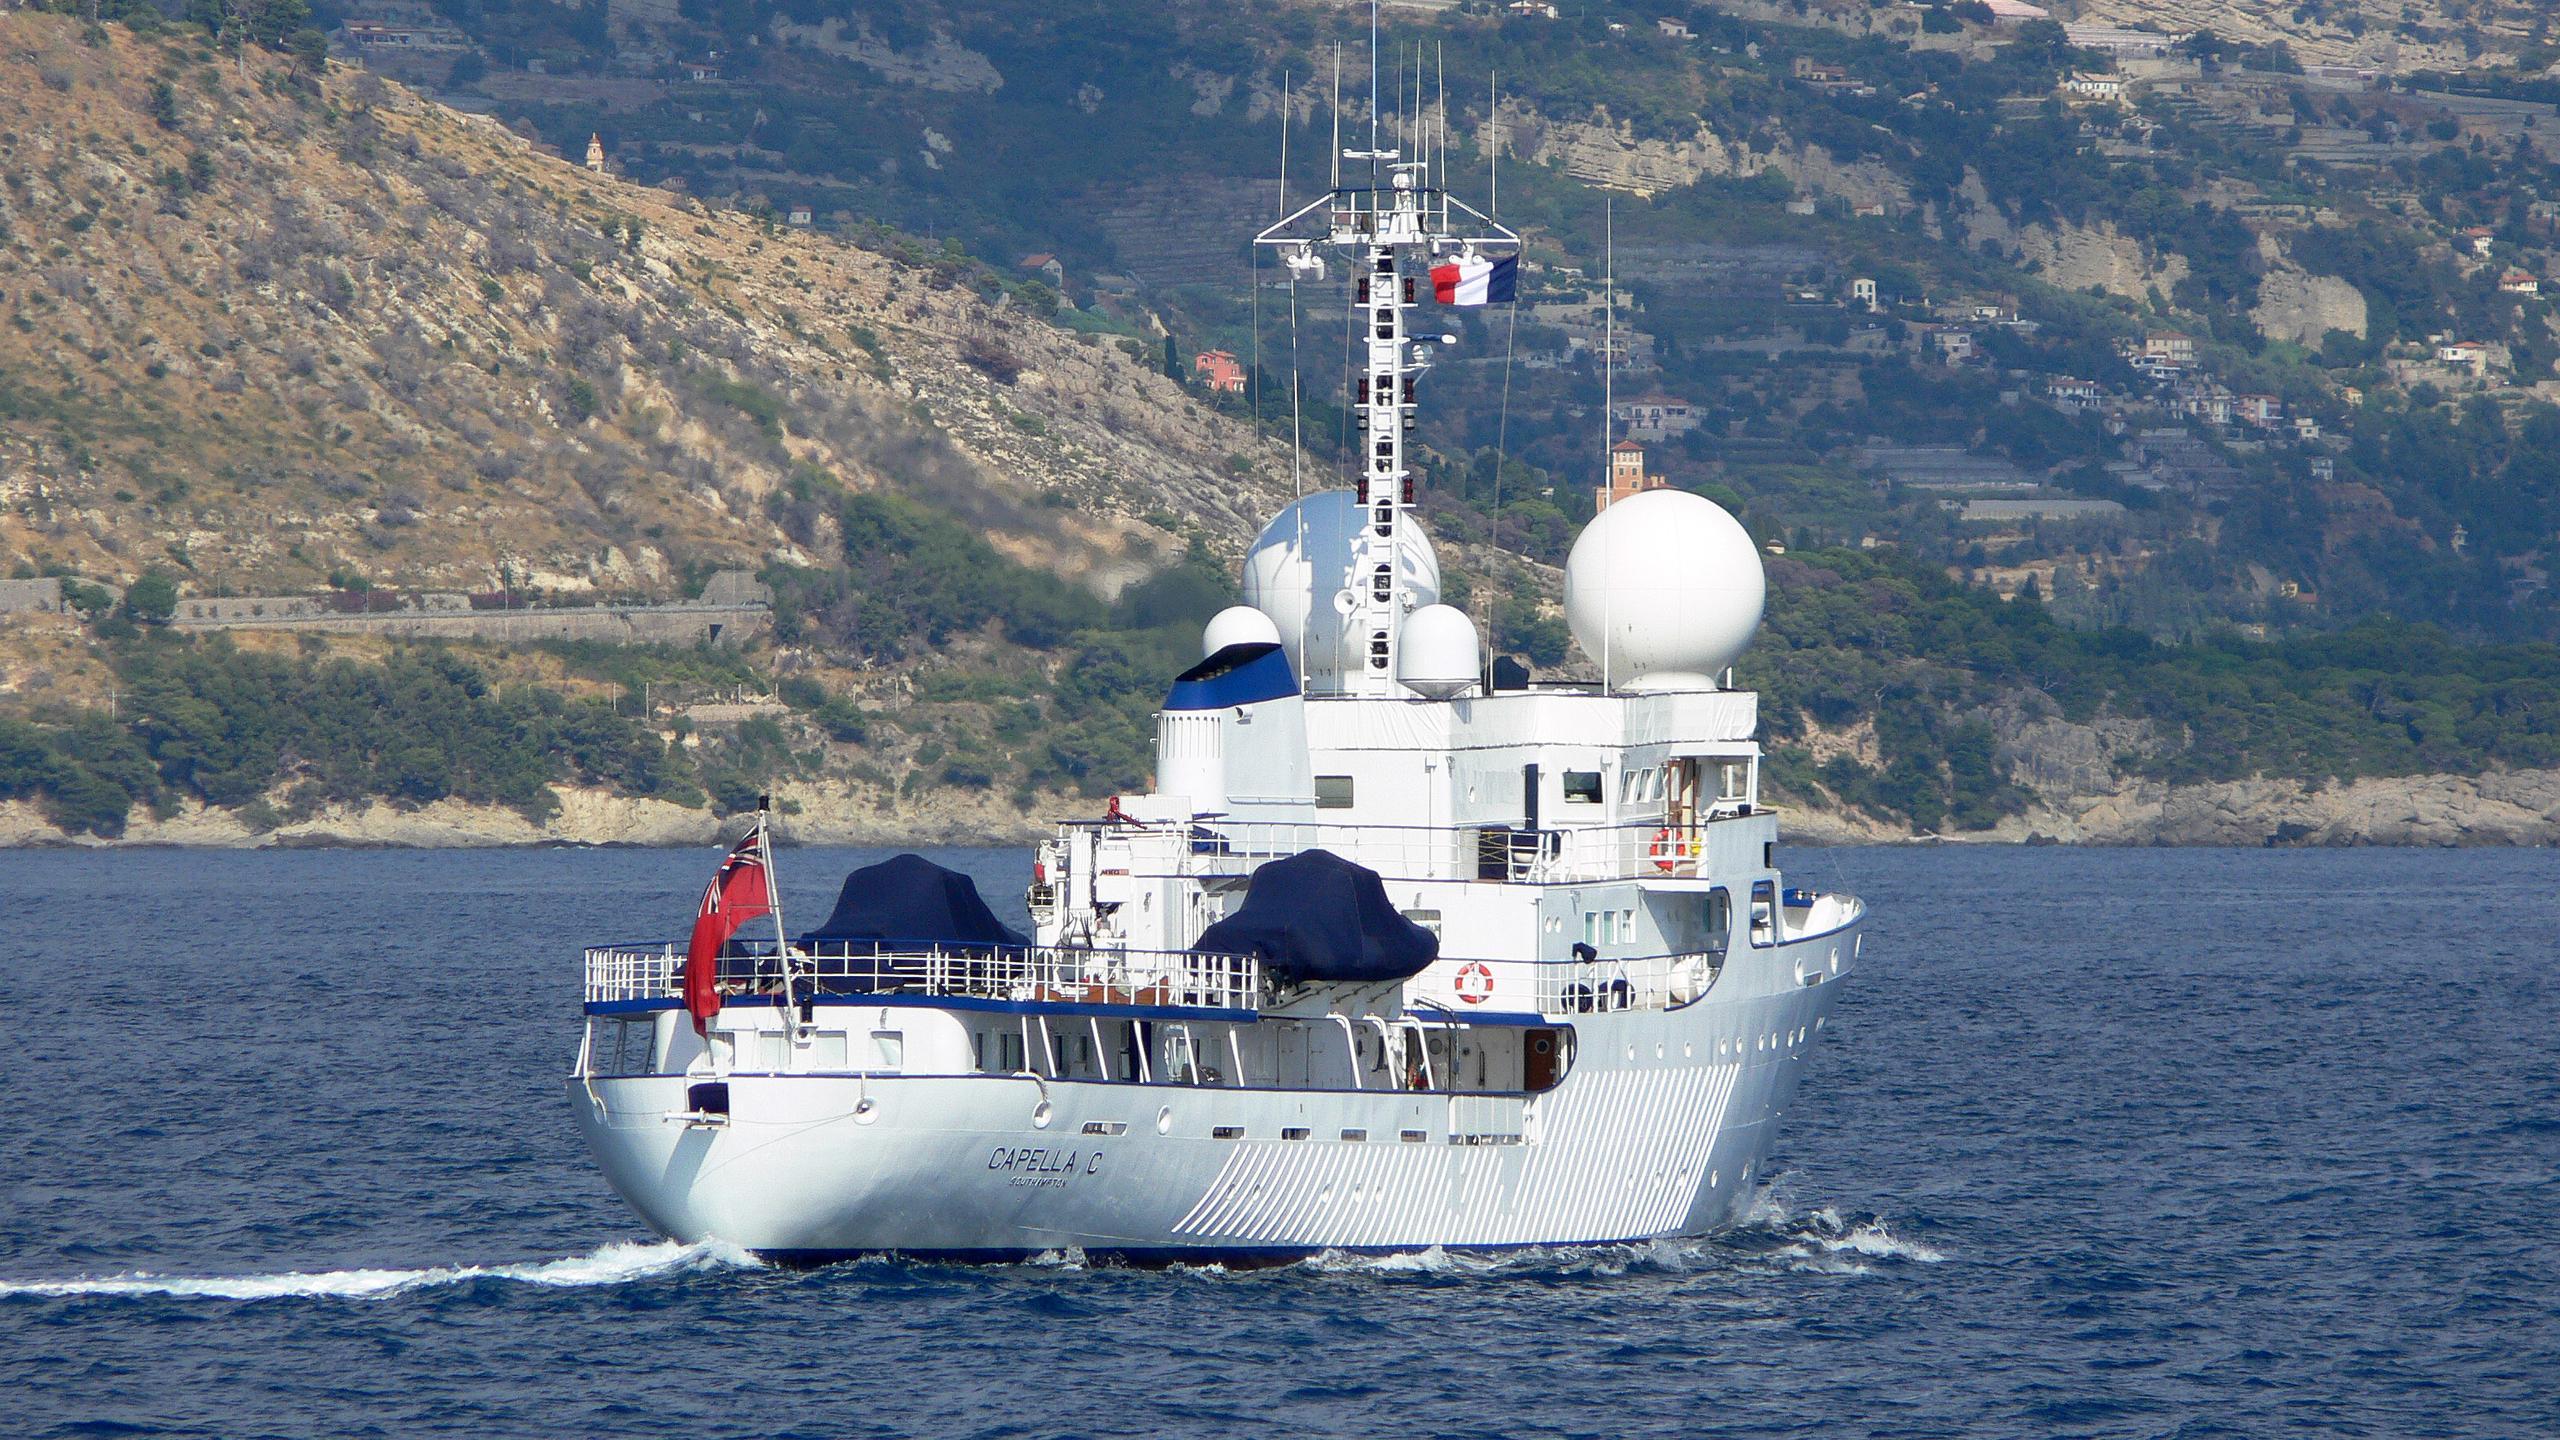 capella-c-explorer-yacht-scheepsbouwwerf-gebroeders-pot-1969-59m-stern-cruising